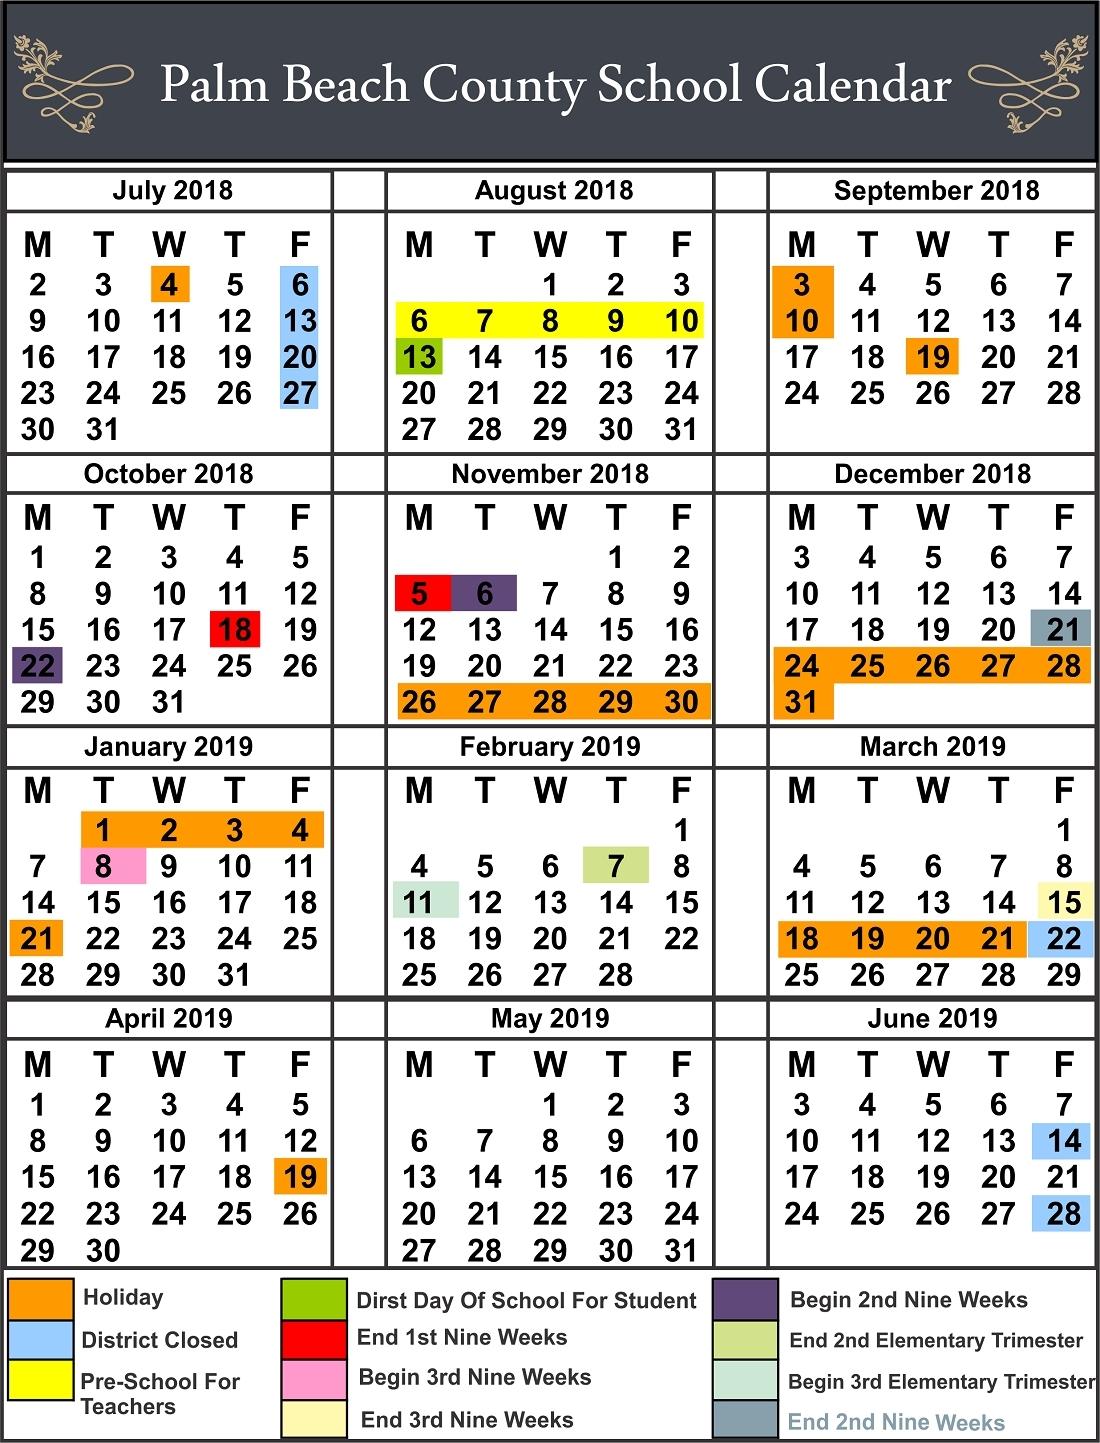 Extraordinary Onslow County School Calendar 9 Week • Printable Blank_Onslow County School Calendar 9 Week